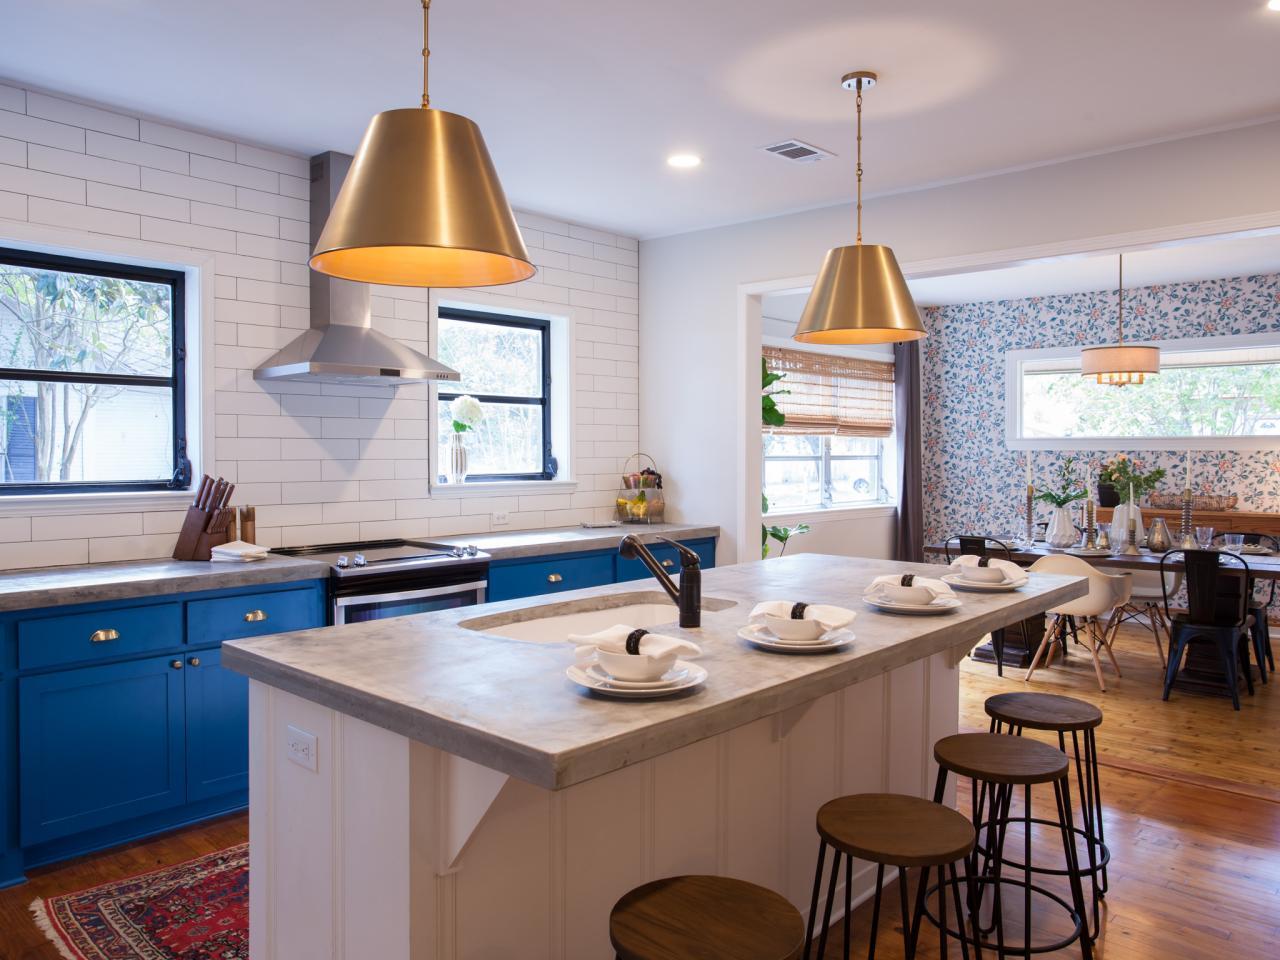 hgtv home town season 1 episode 9 recap hgtv s decorating kitchen before